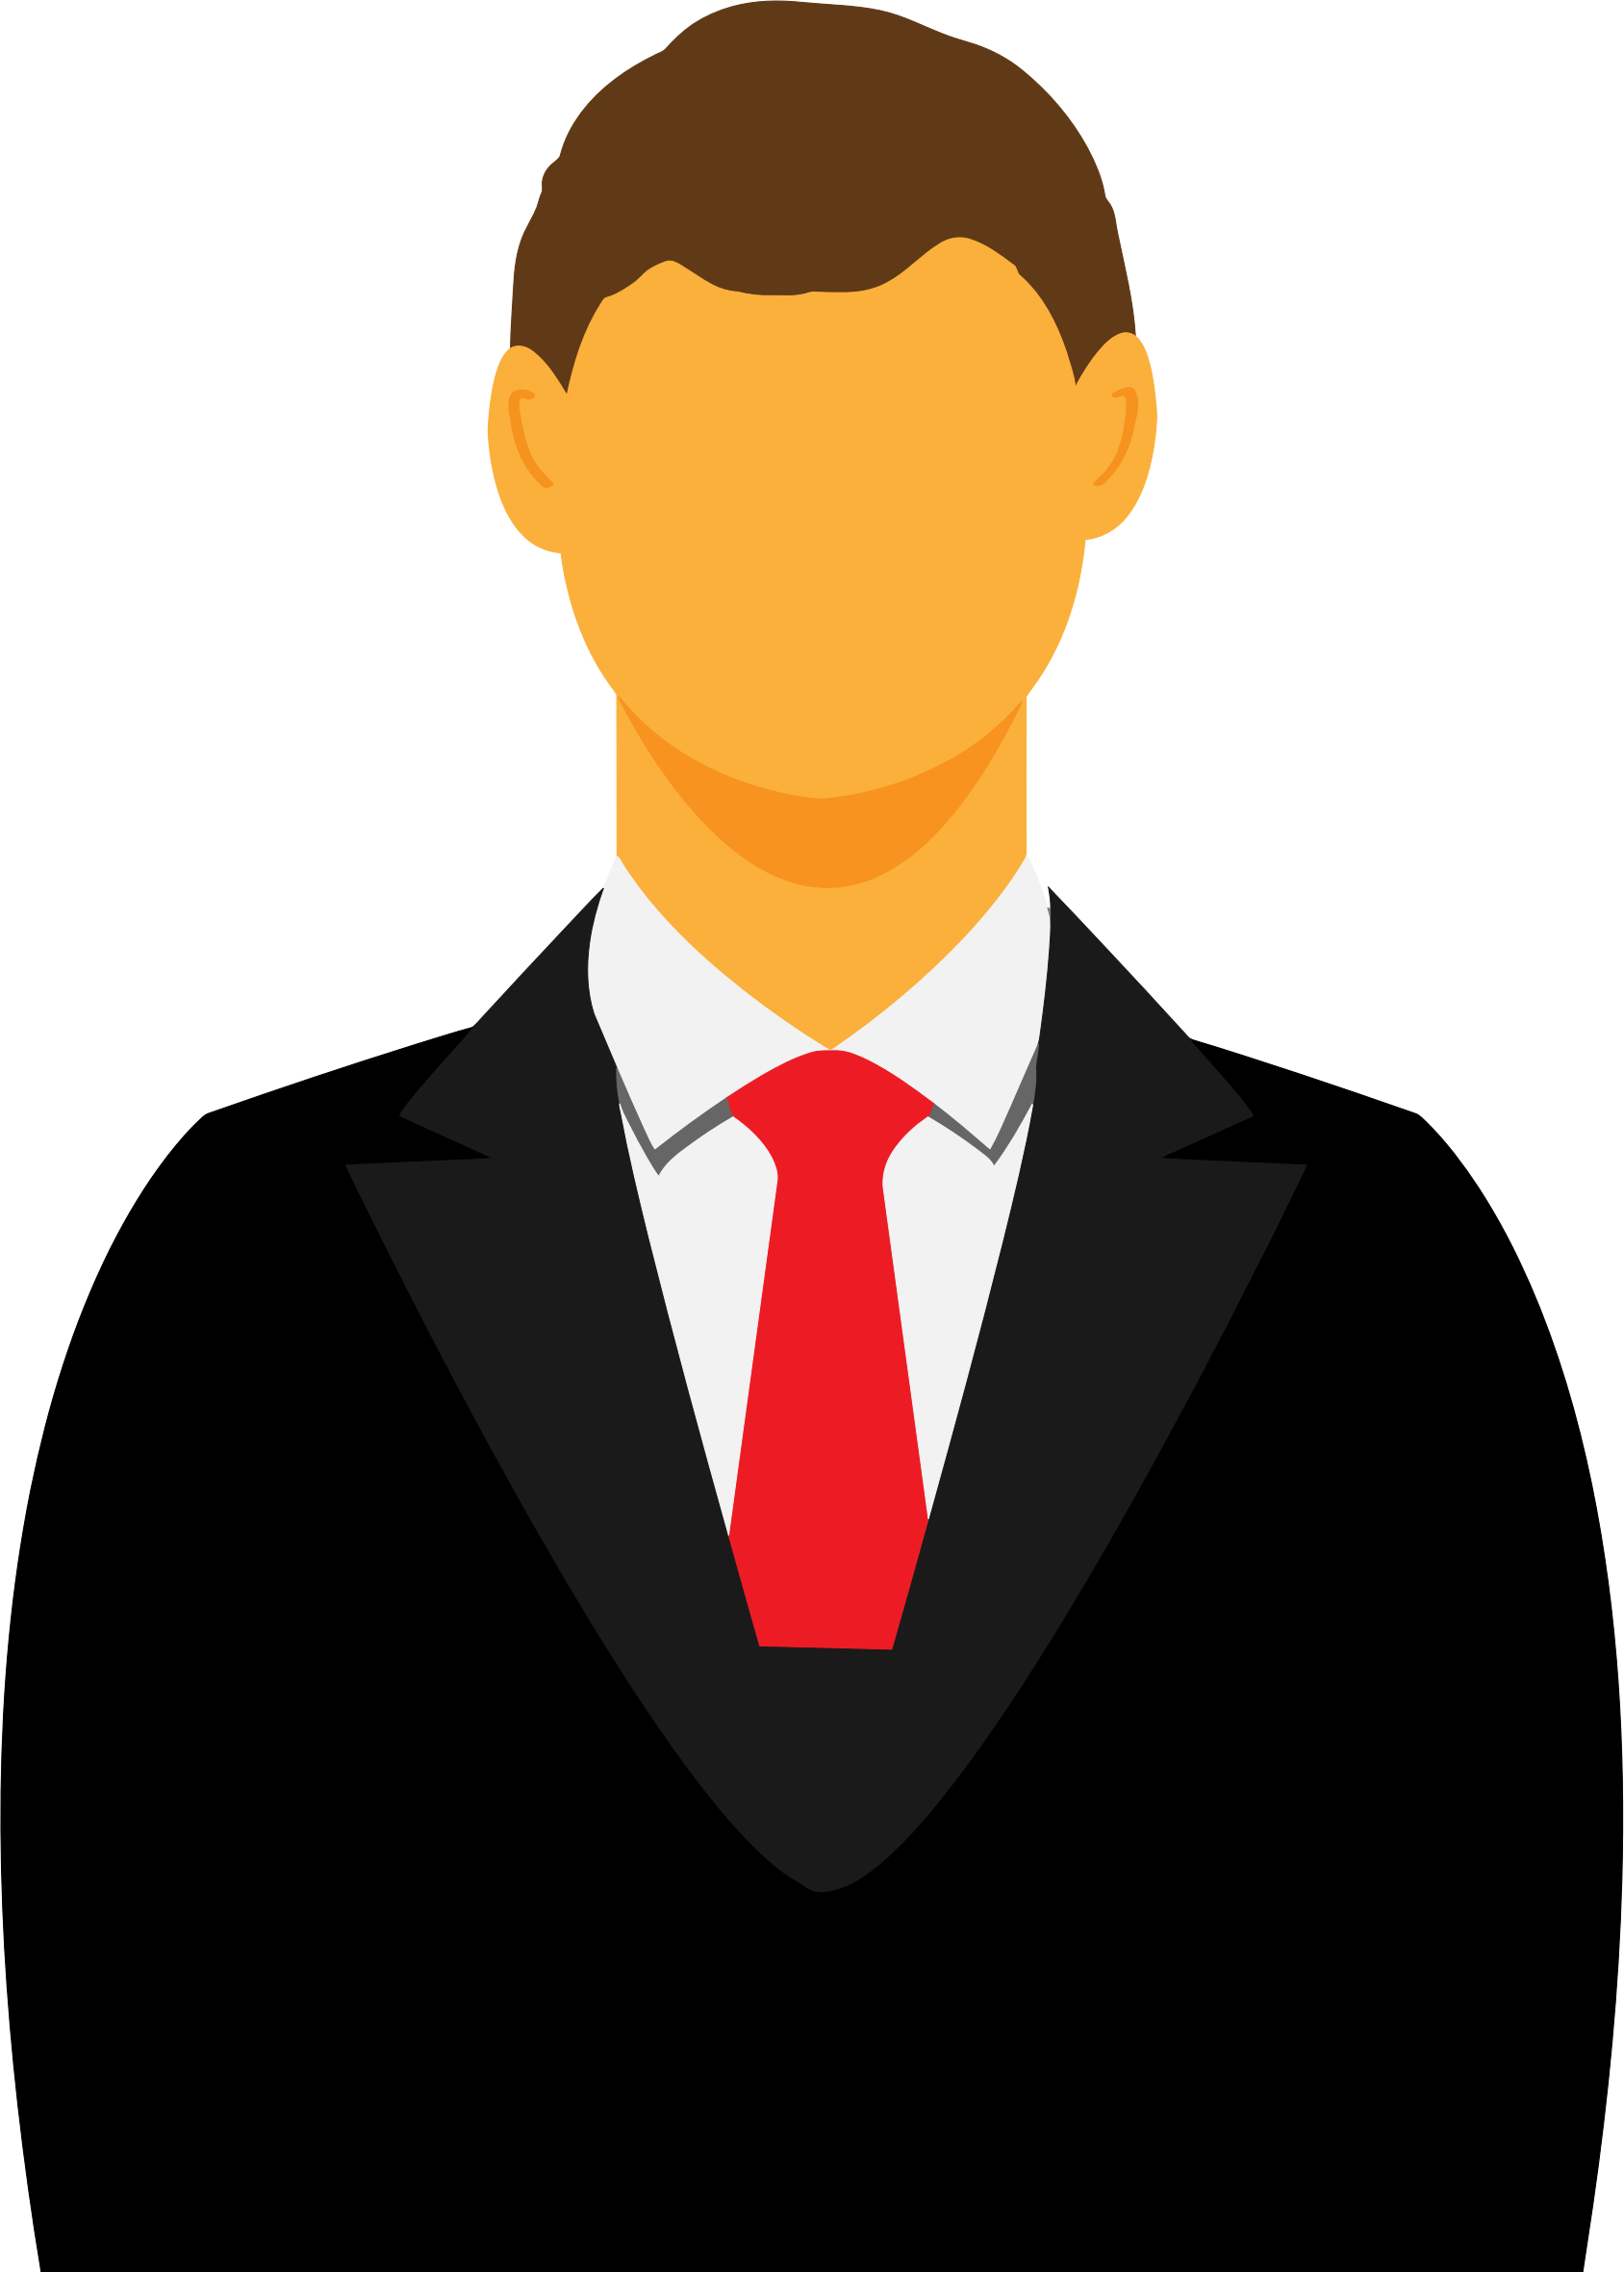 Microsoft clipart avatar, Microsoft avatar Transparent FREE.